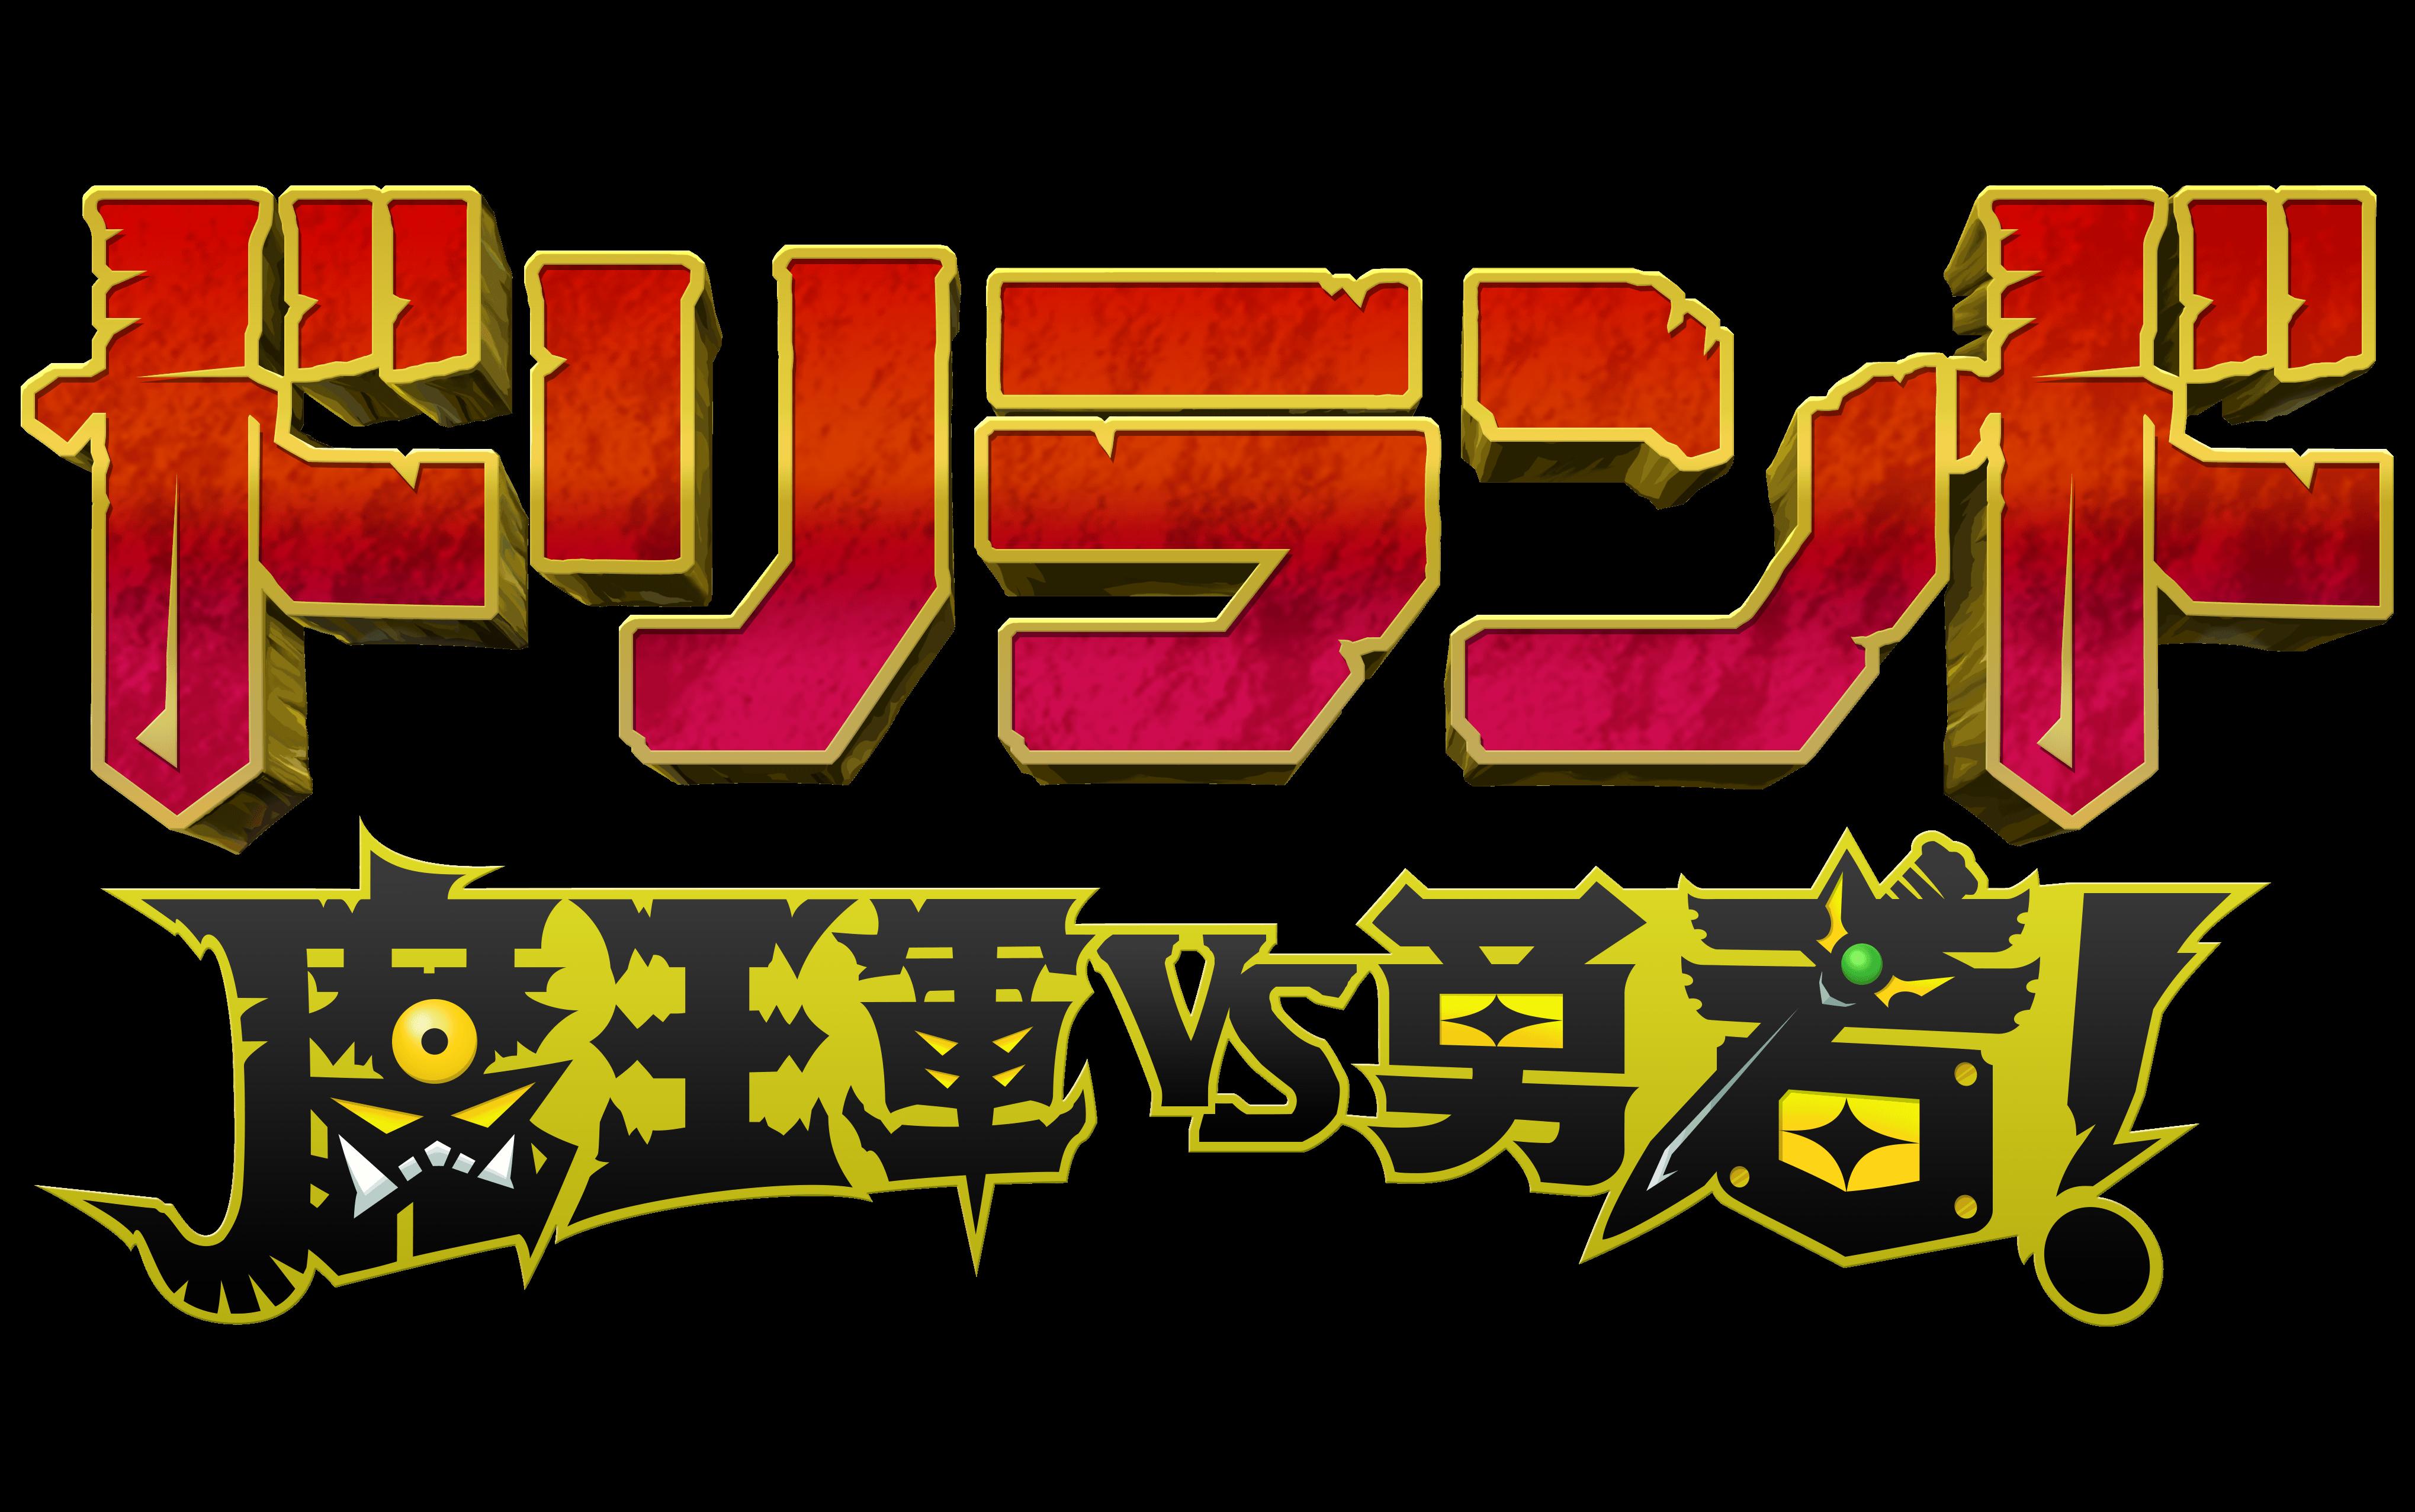 Yahoo! JAPANとGREEの合弁会社ジクシーズ、第1弾タイトル「ドリランド 魔王軍 vs 勇者!」を提供開始1